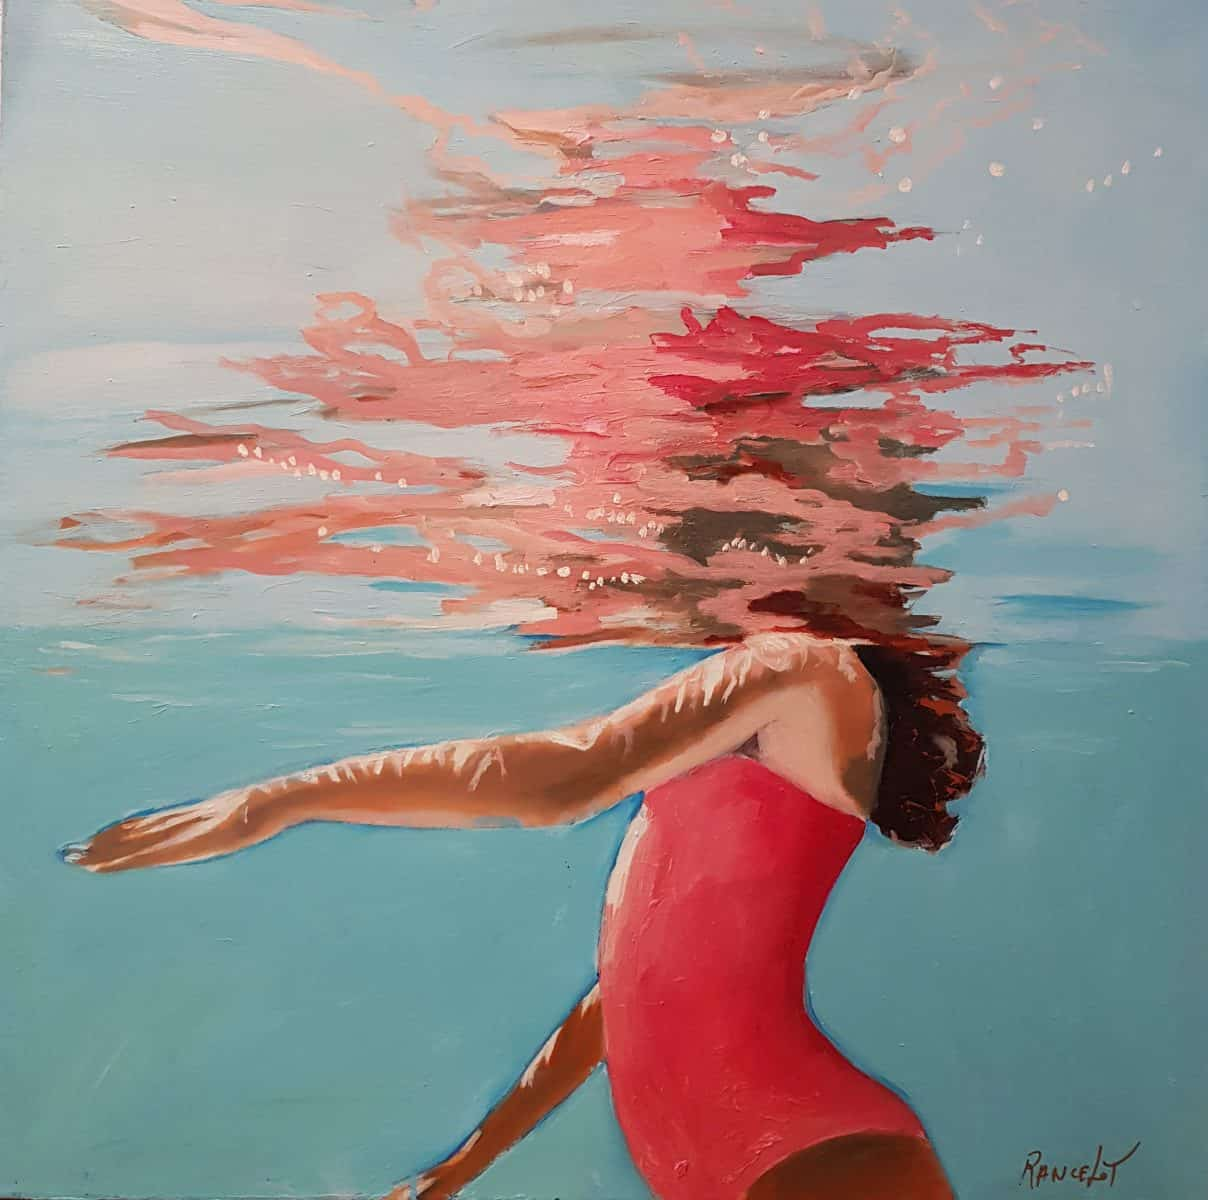 Christiane RANCELOT Artiste Peintre Galerie d'Art Sylvie Platini Lyon Annecy